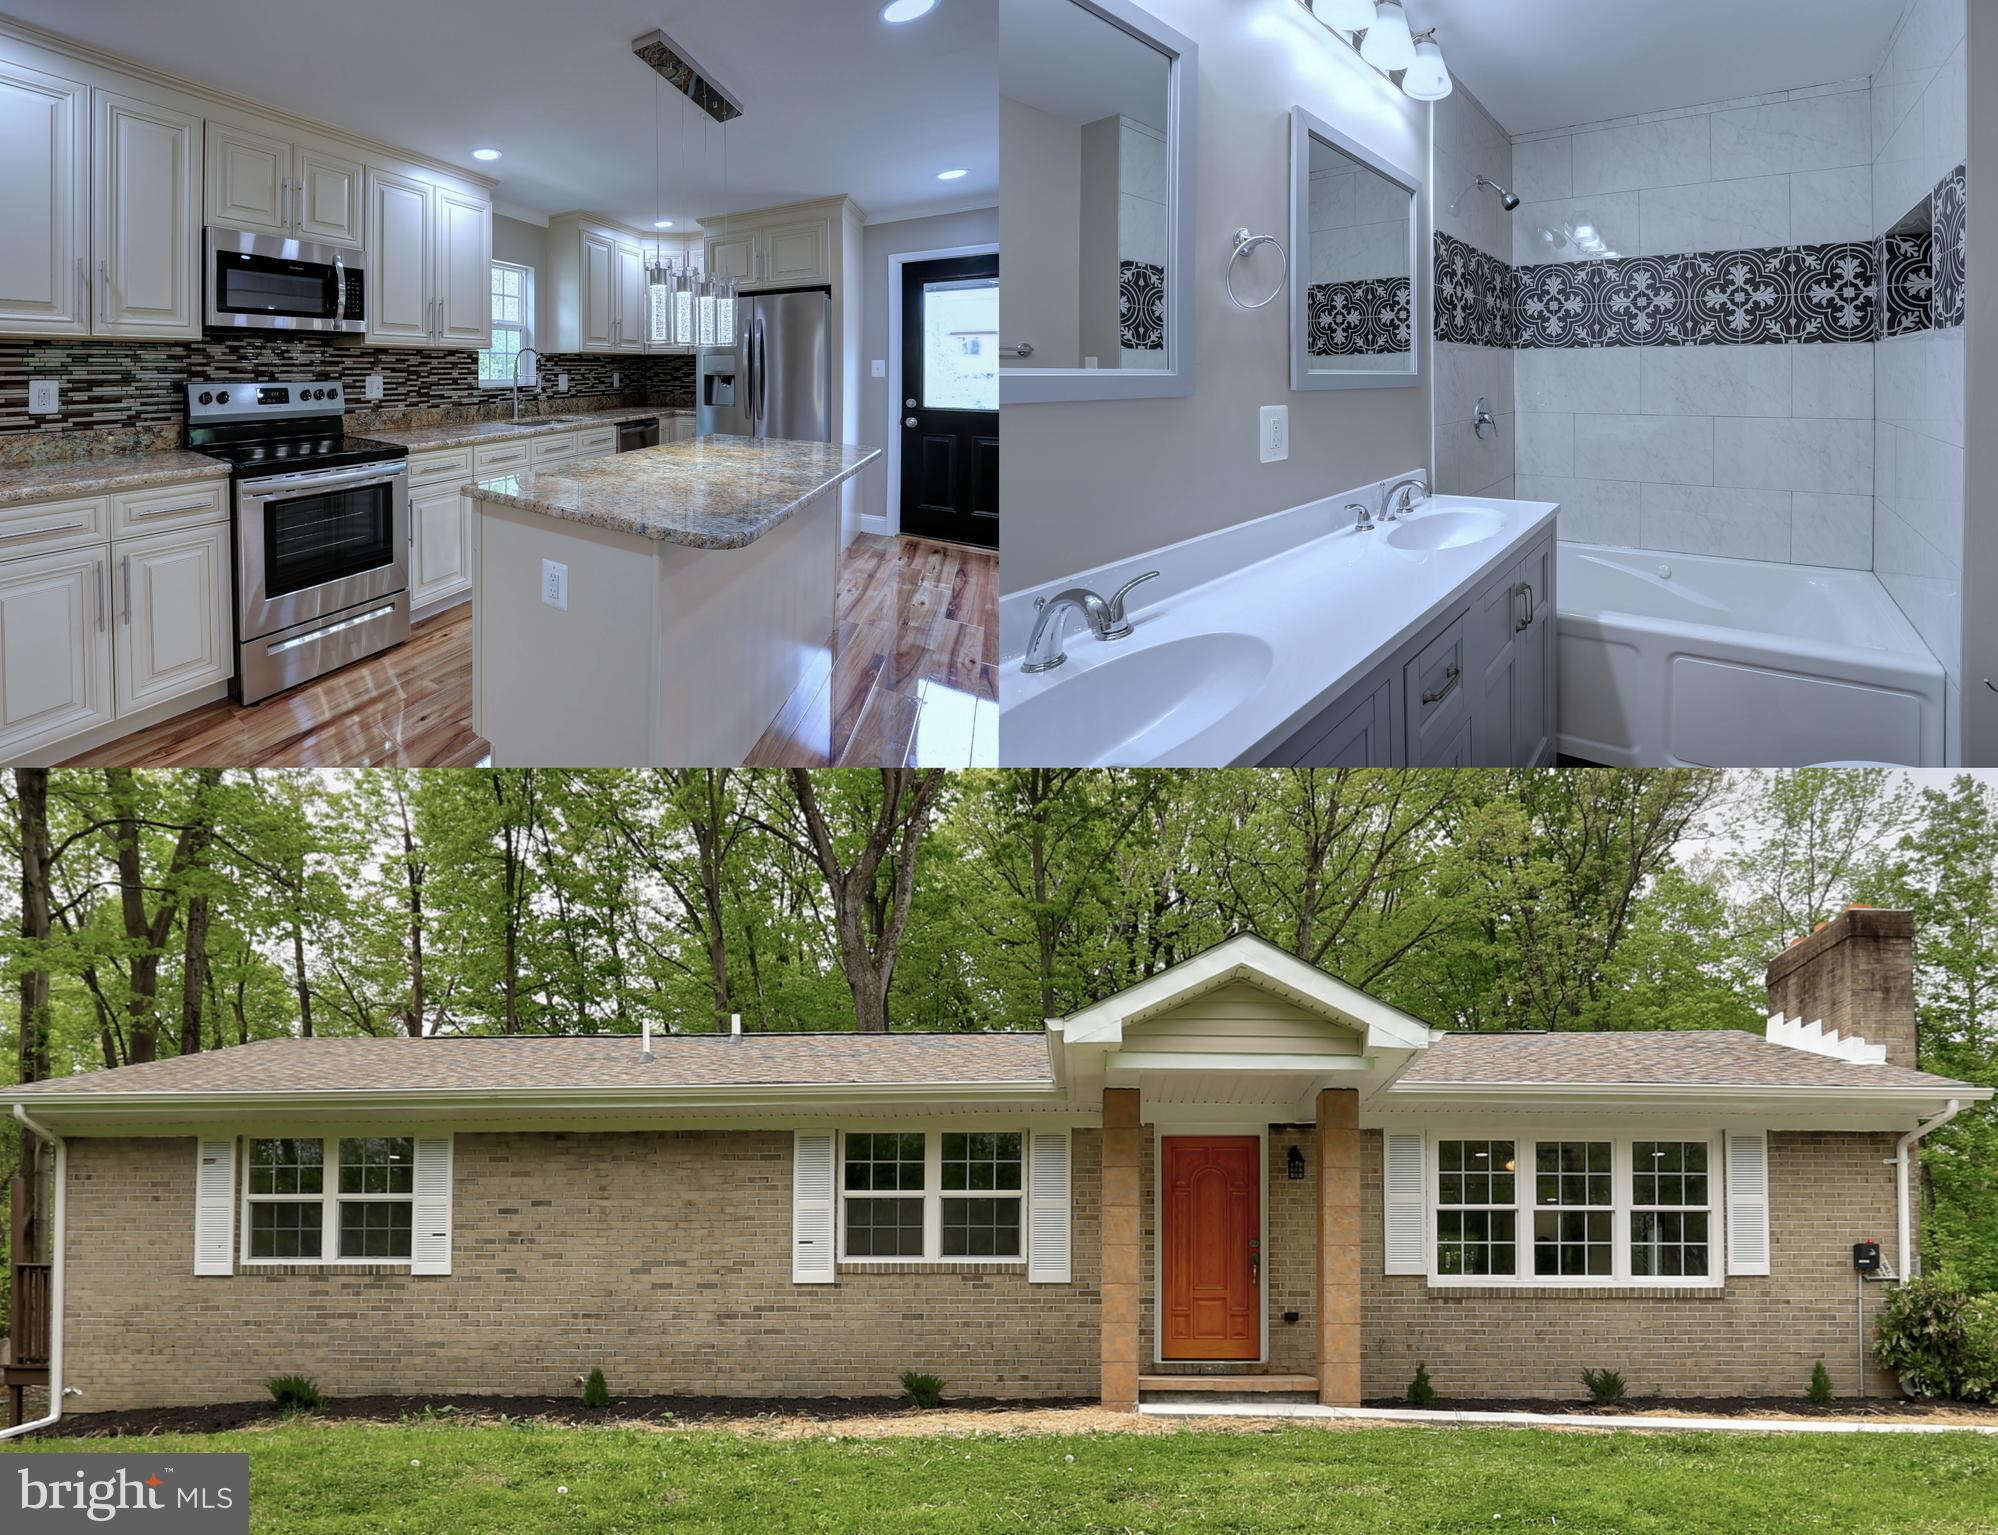 5807 RAILROAD AVENUE, WHITE MARSH, Maryland 21162, 4 Bedrooms Bedrooms, ,4 BathroomsBathrooms,Single Family,For Sale,5807 RAILROAD AVENUE,MDBC526850